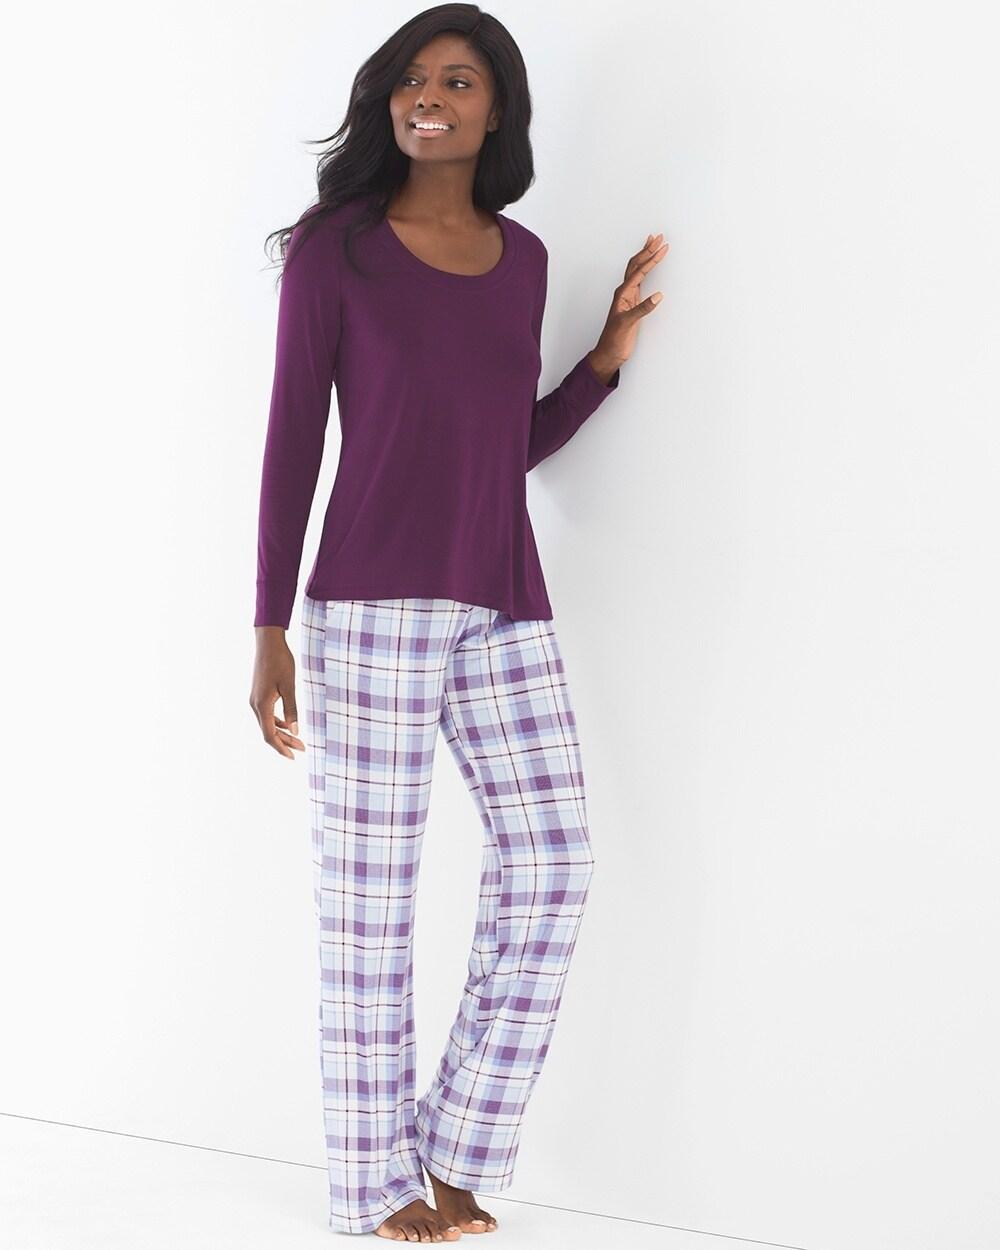 Favorite Spring Pajamas From Soma - Stylish Sassy & Classy